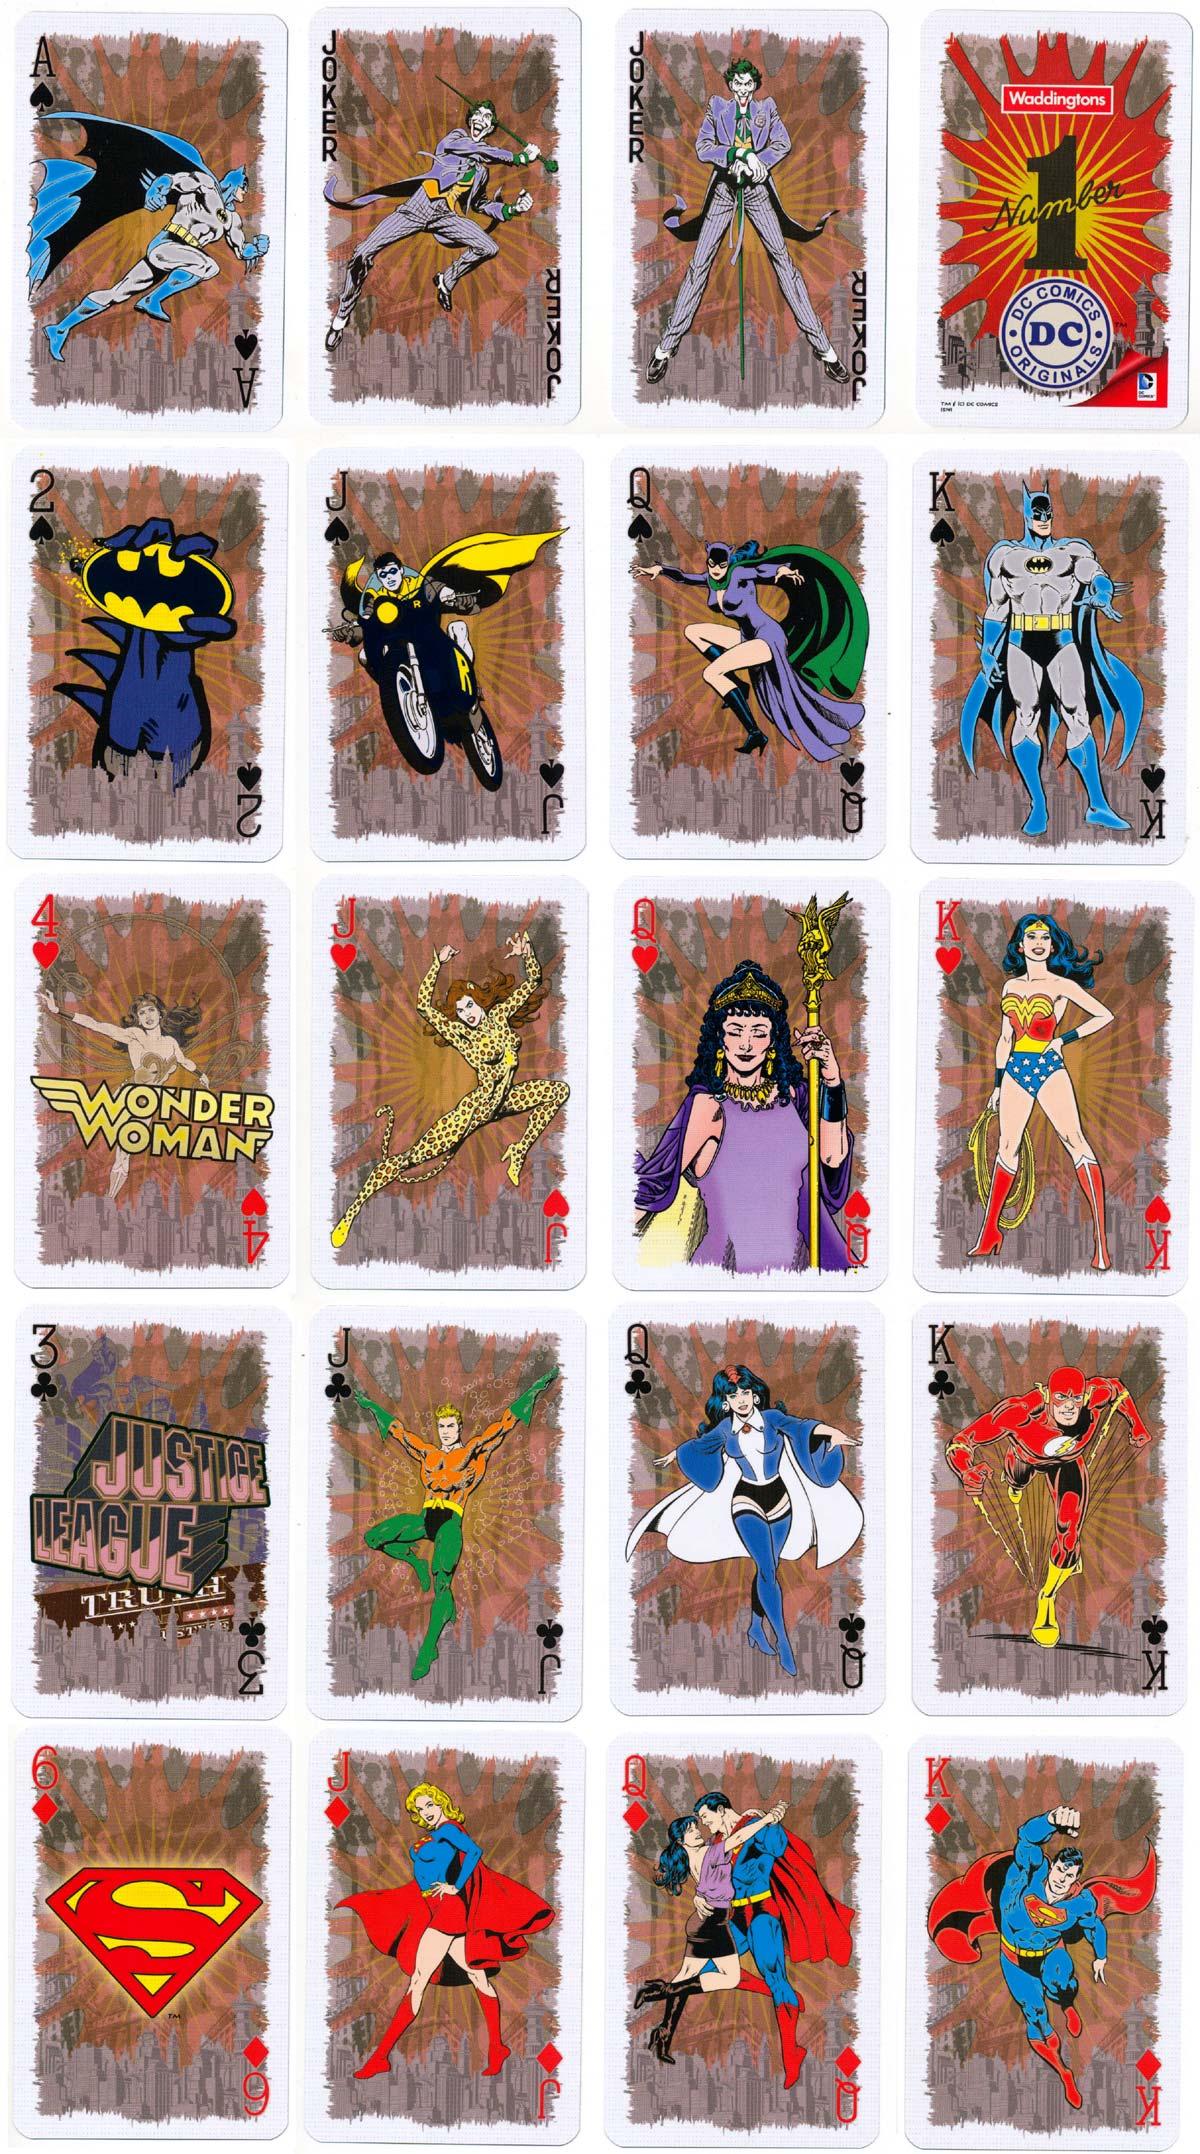 Waddingtons 'DC Comics Originals' deck published by Winning Moves, 2014